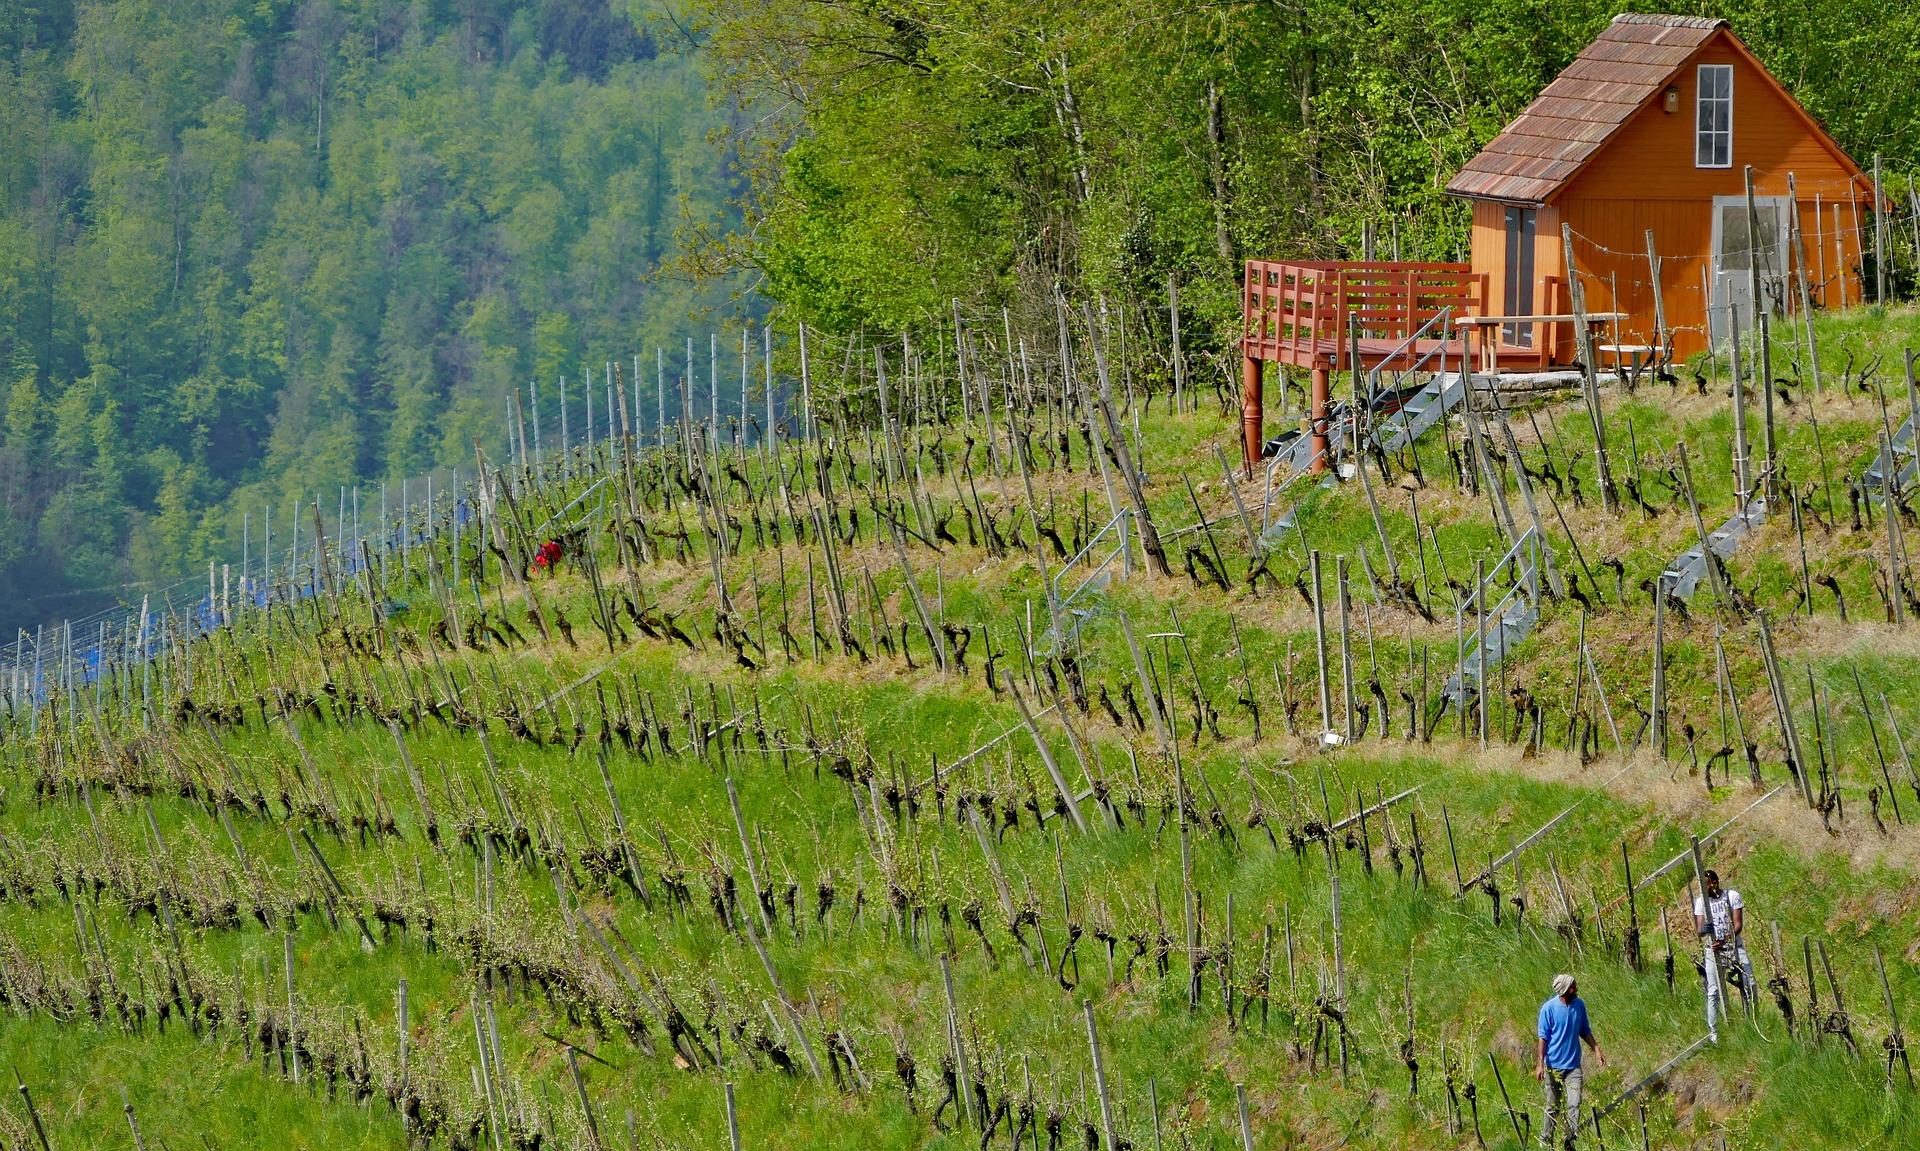 dům ve vinohradu